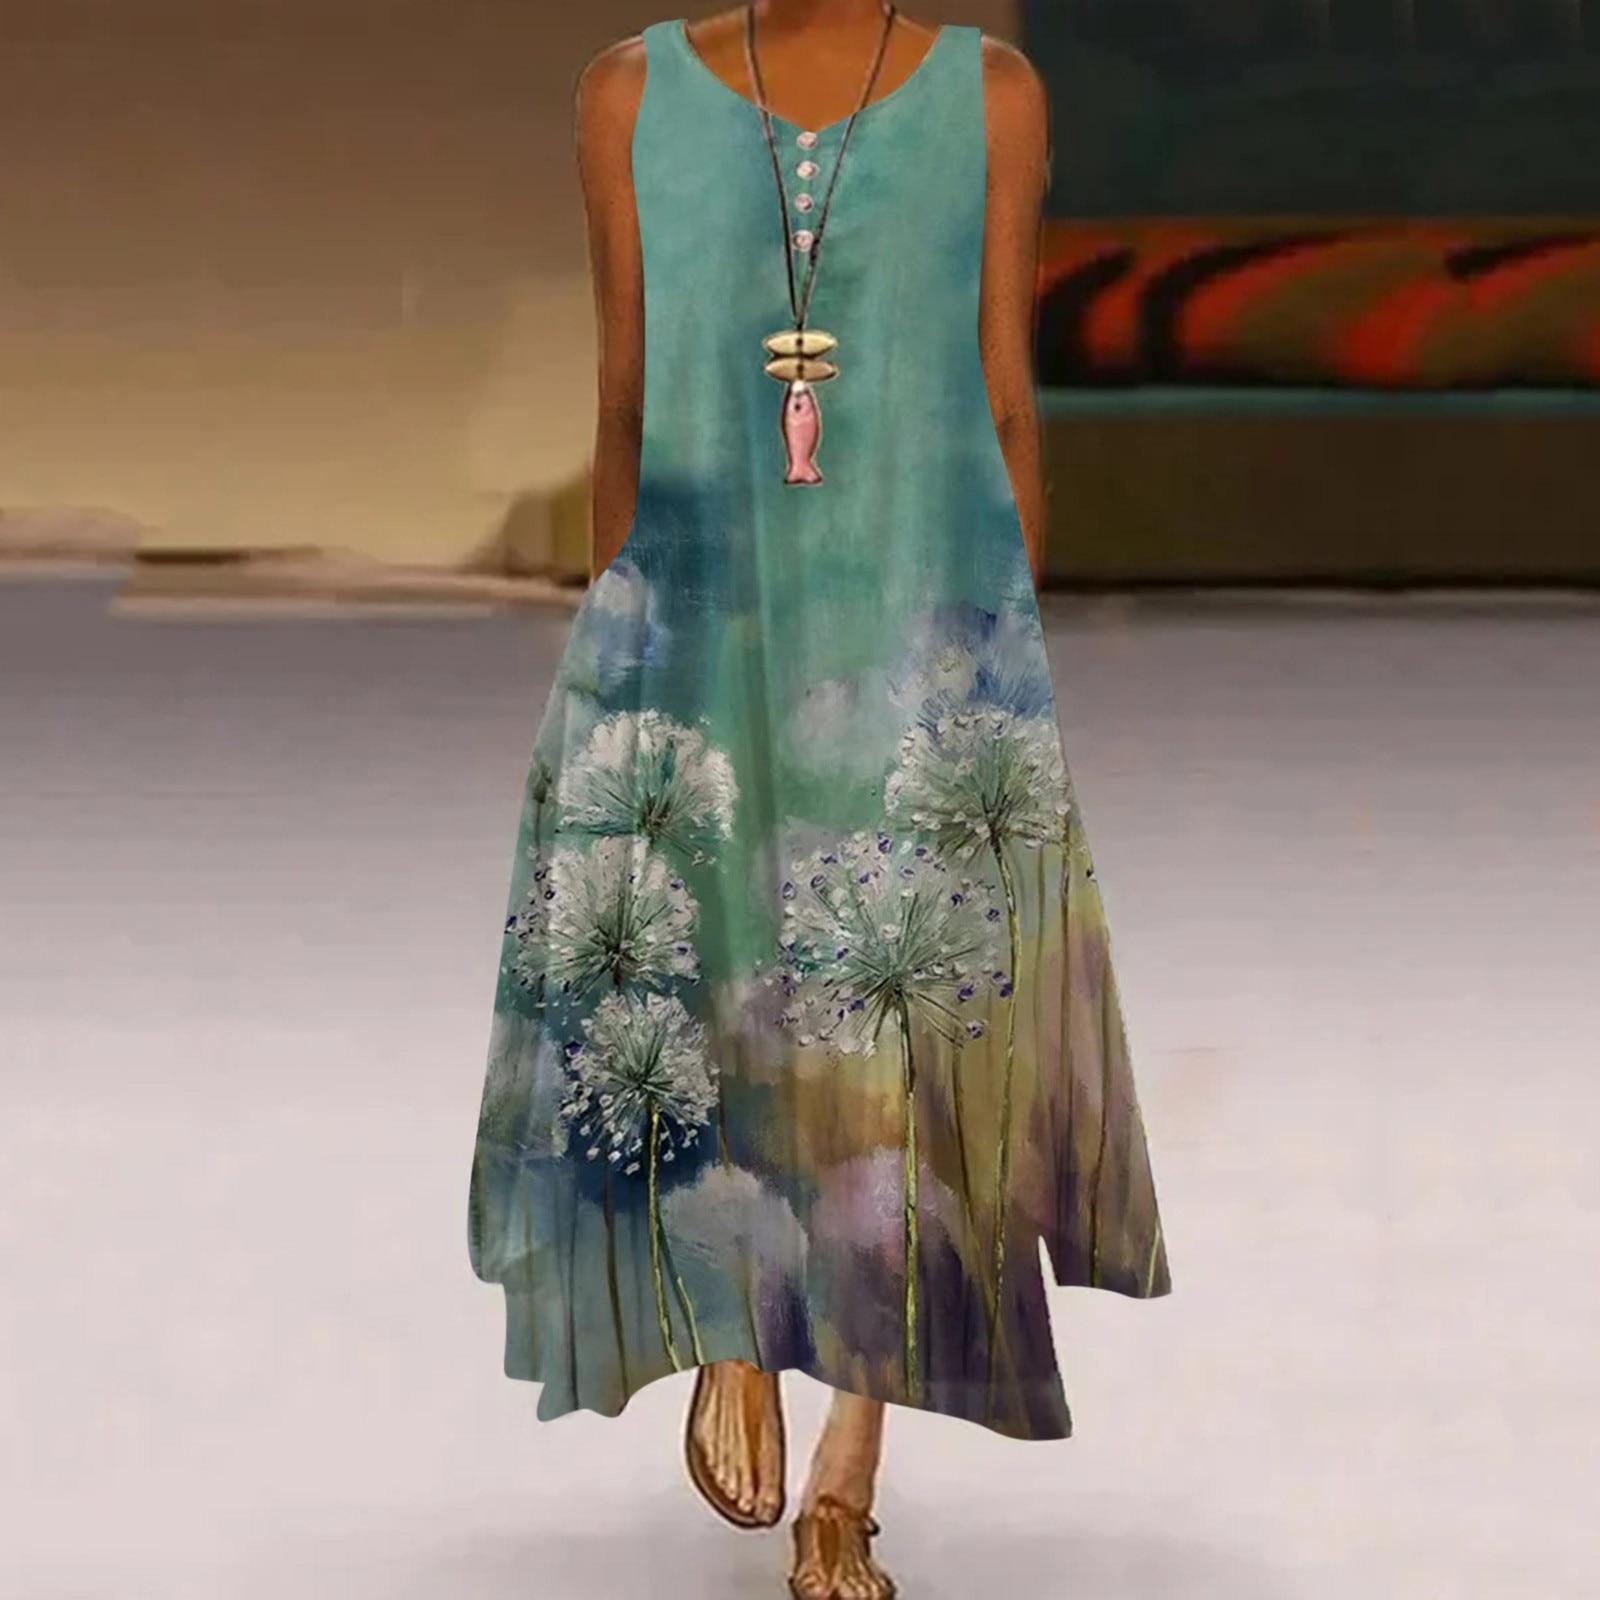 40# Vintage Maxi Dress Women Plus Size Tank Dress Floral Printed Sleeveless O-neck Dresses For Women 2021 Boho Pocket Robe Femme